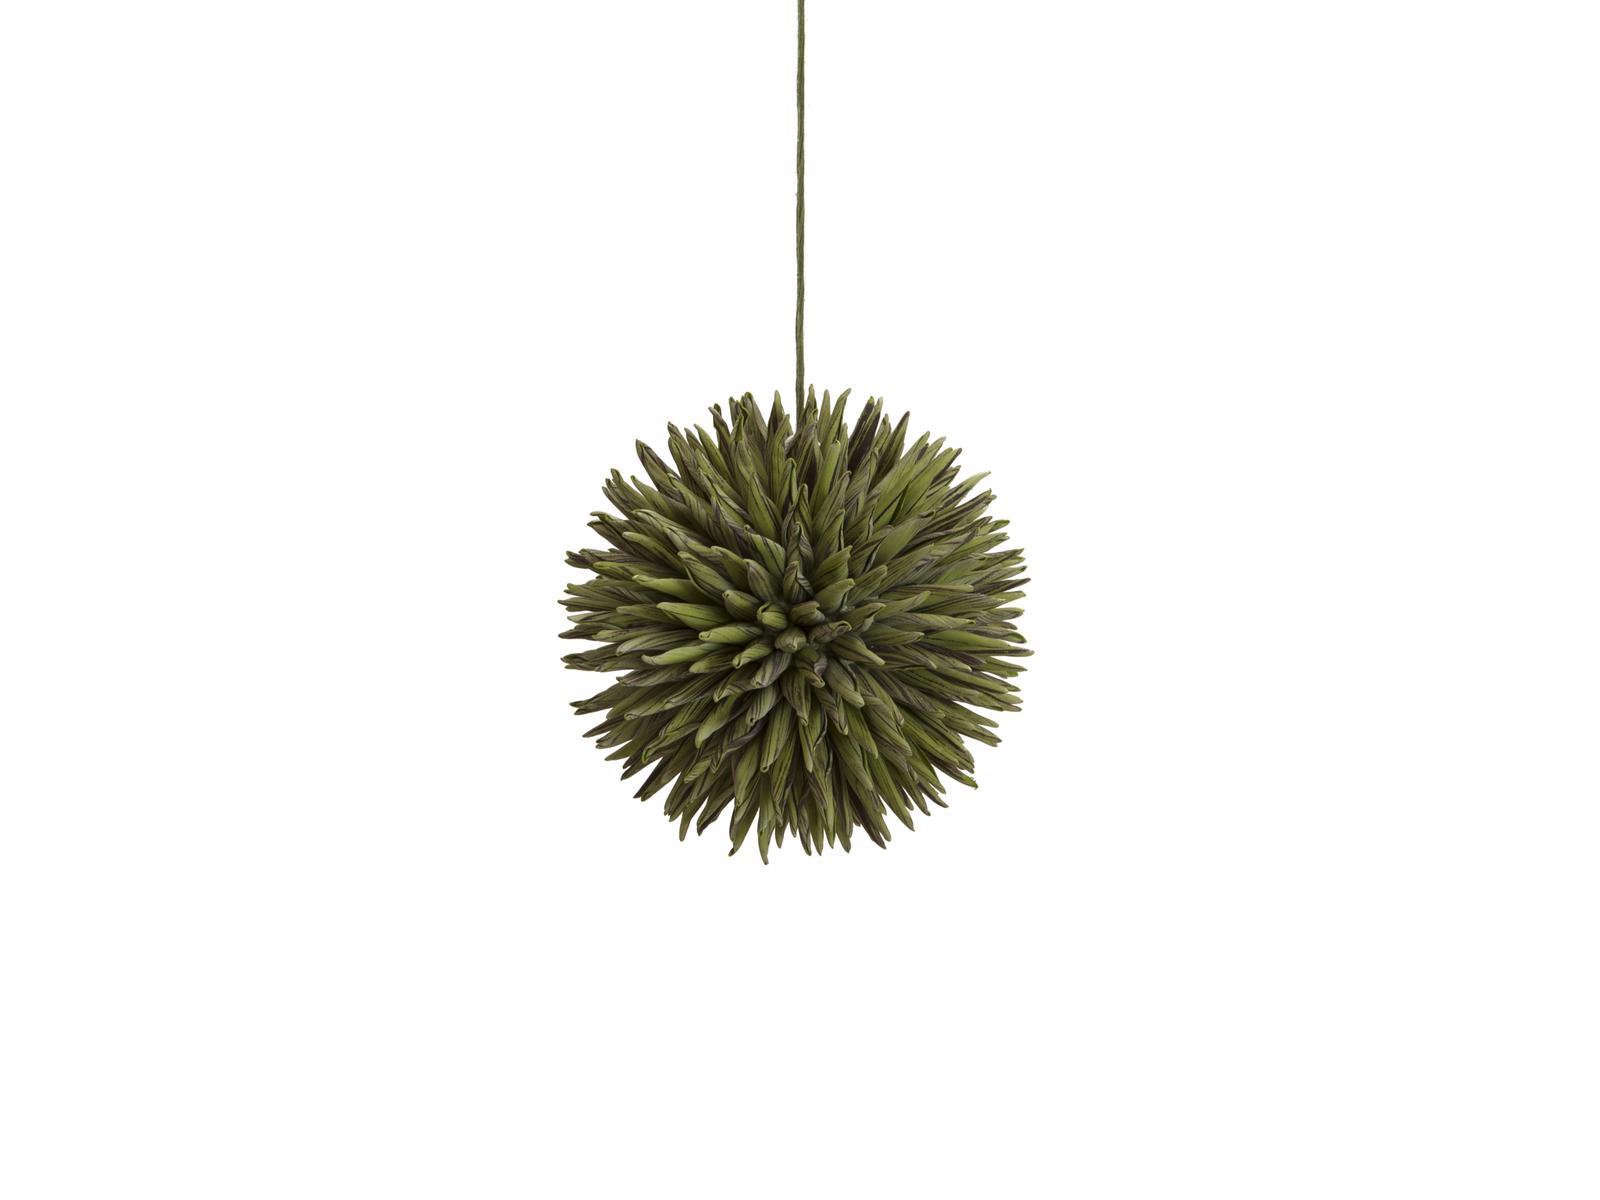 Sukulent koule (EVA), zelený, 16 cm